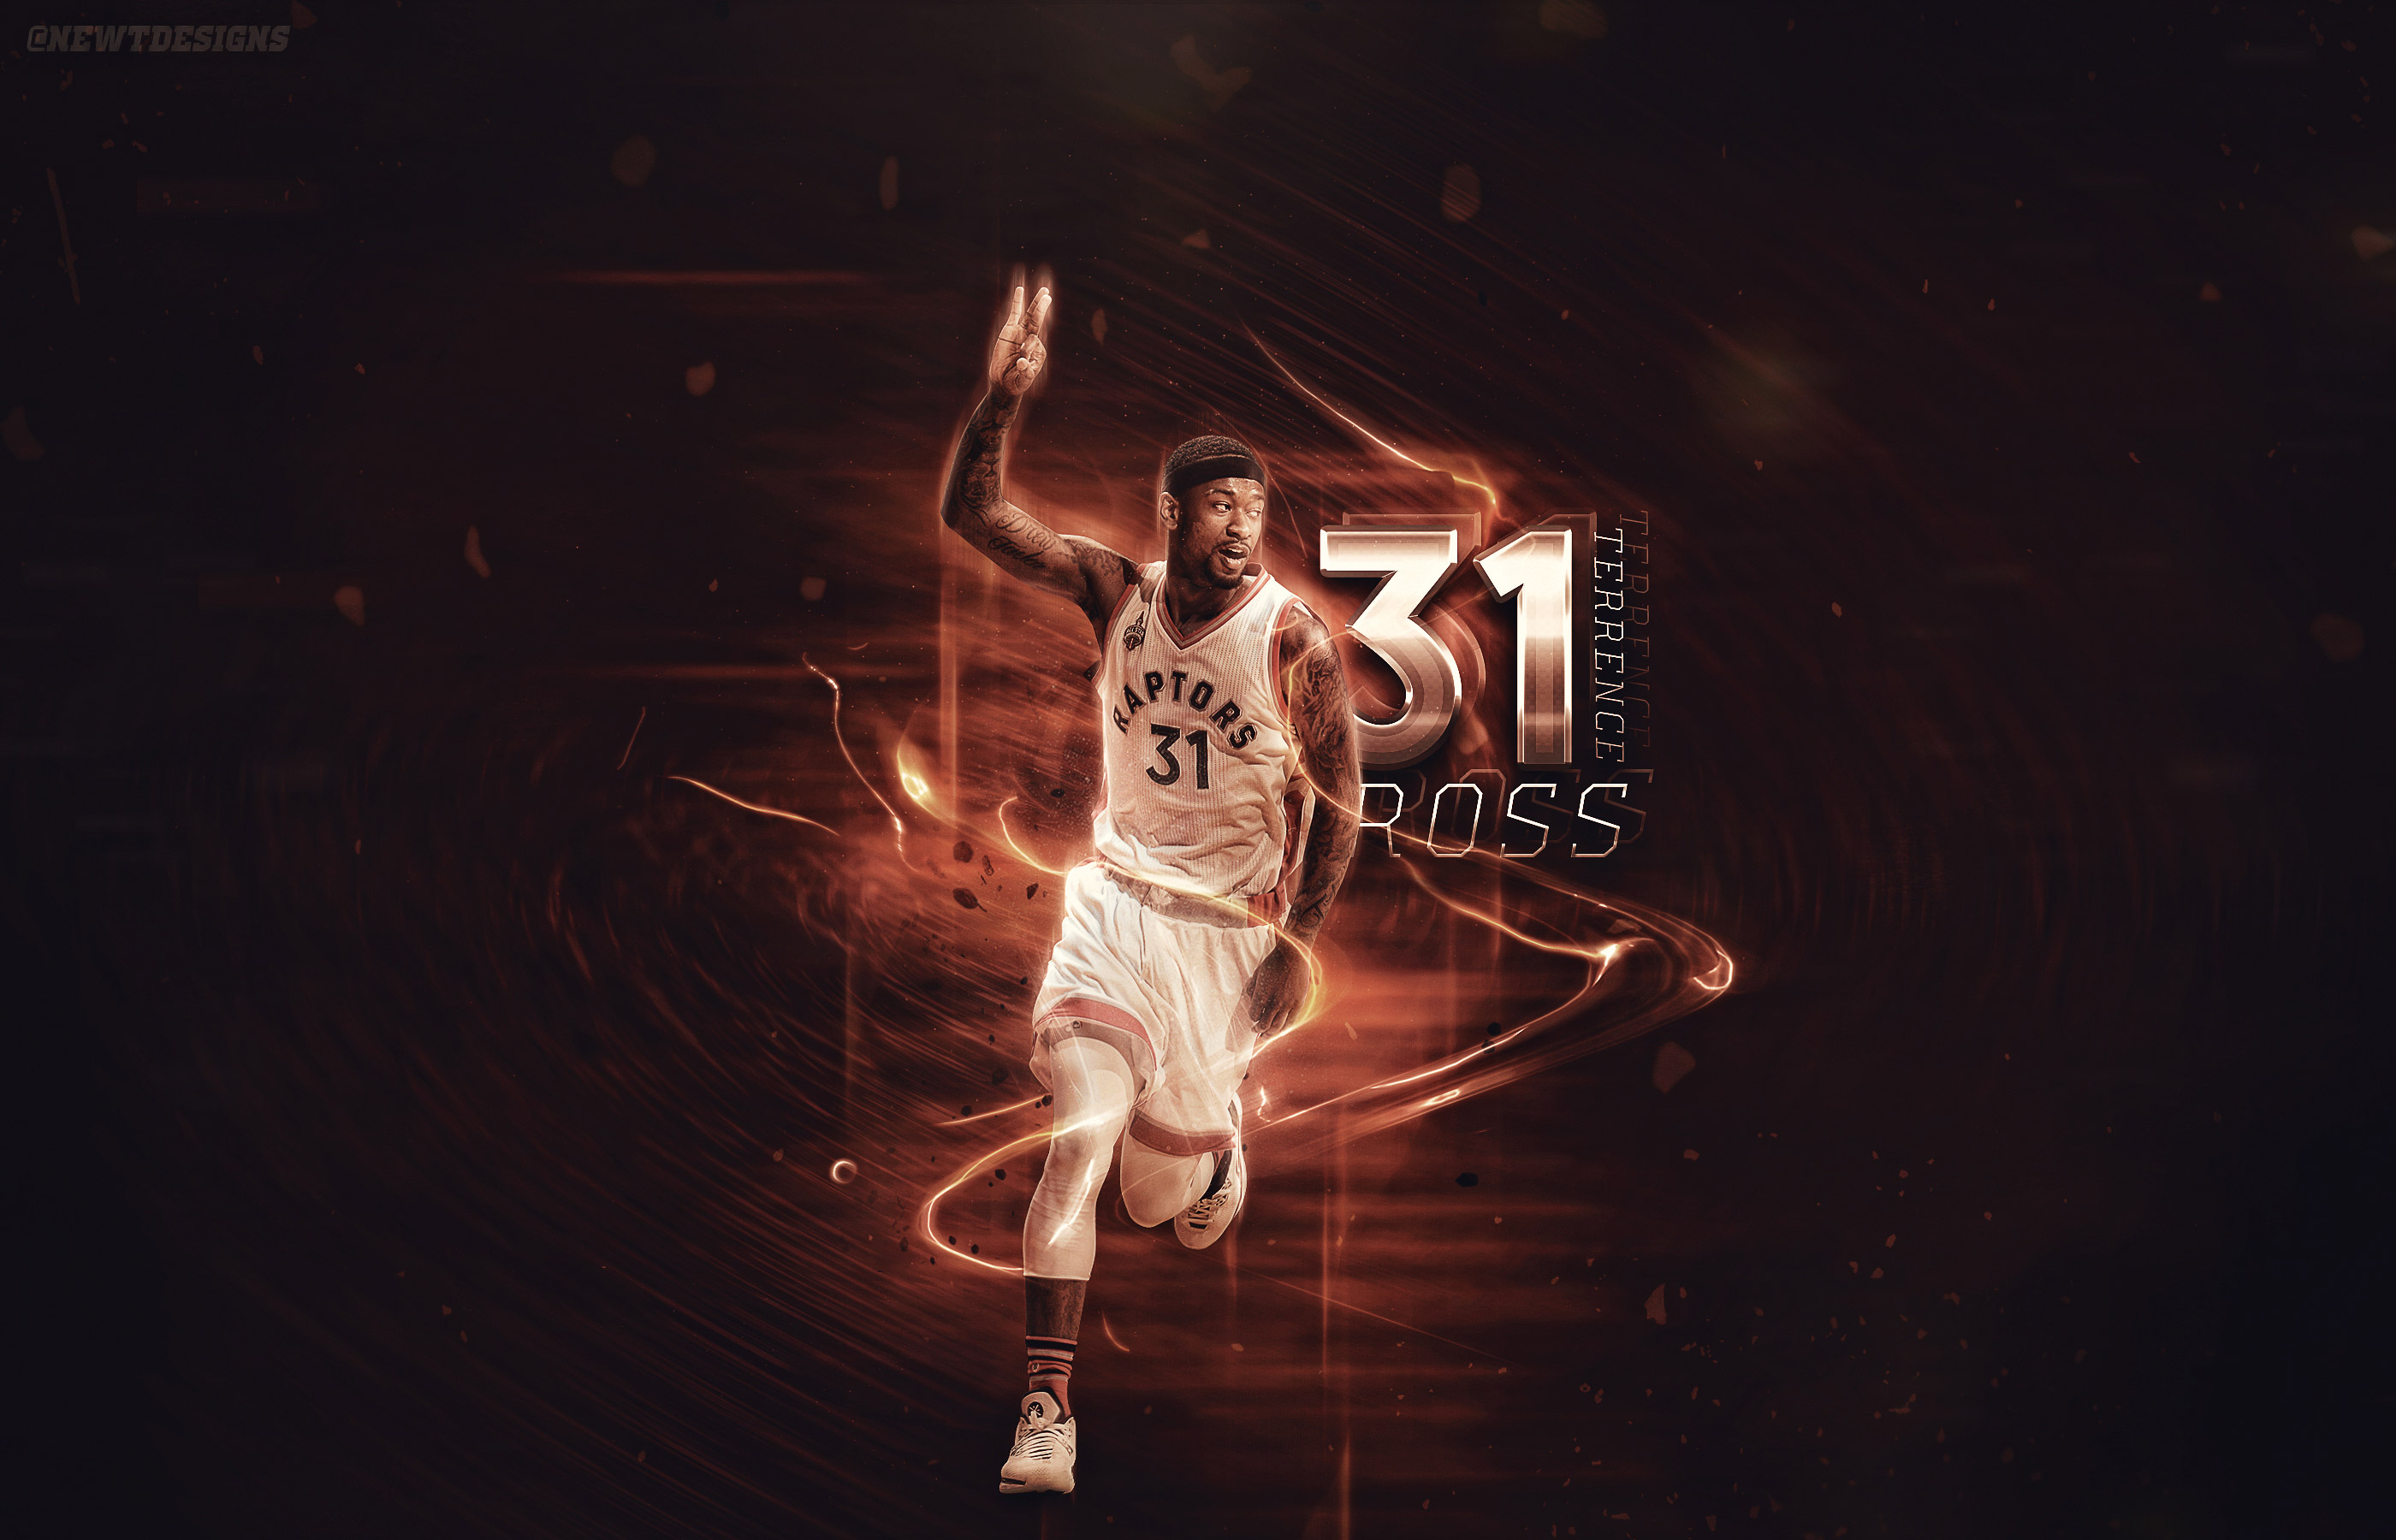 Terrence Ross Toronto Raptors 2016 Wallpaper Basketball Wallpapers 2800x1800